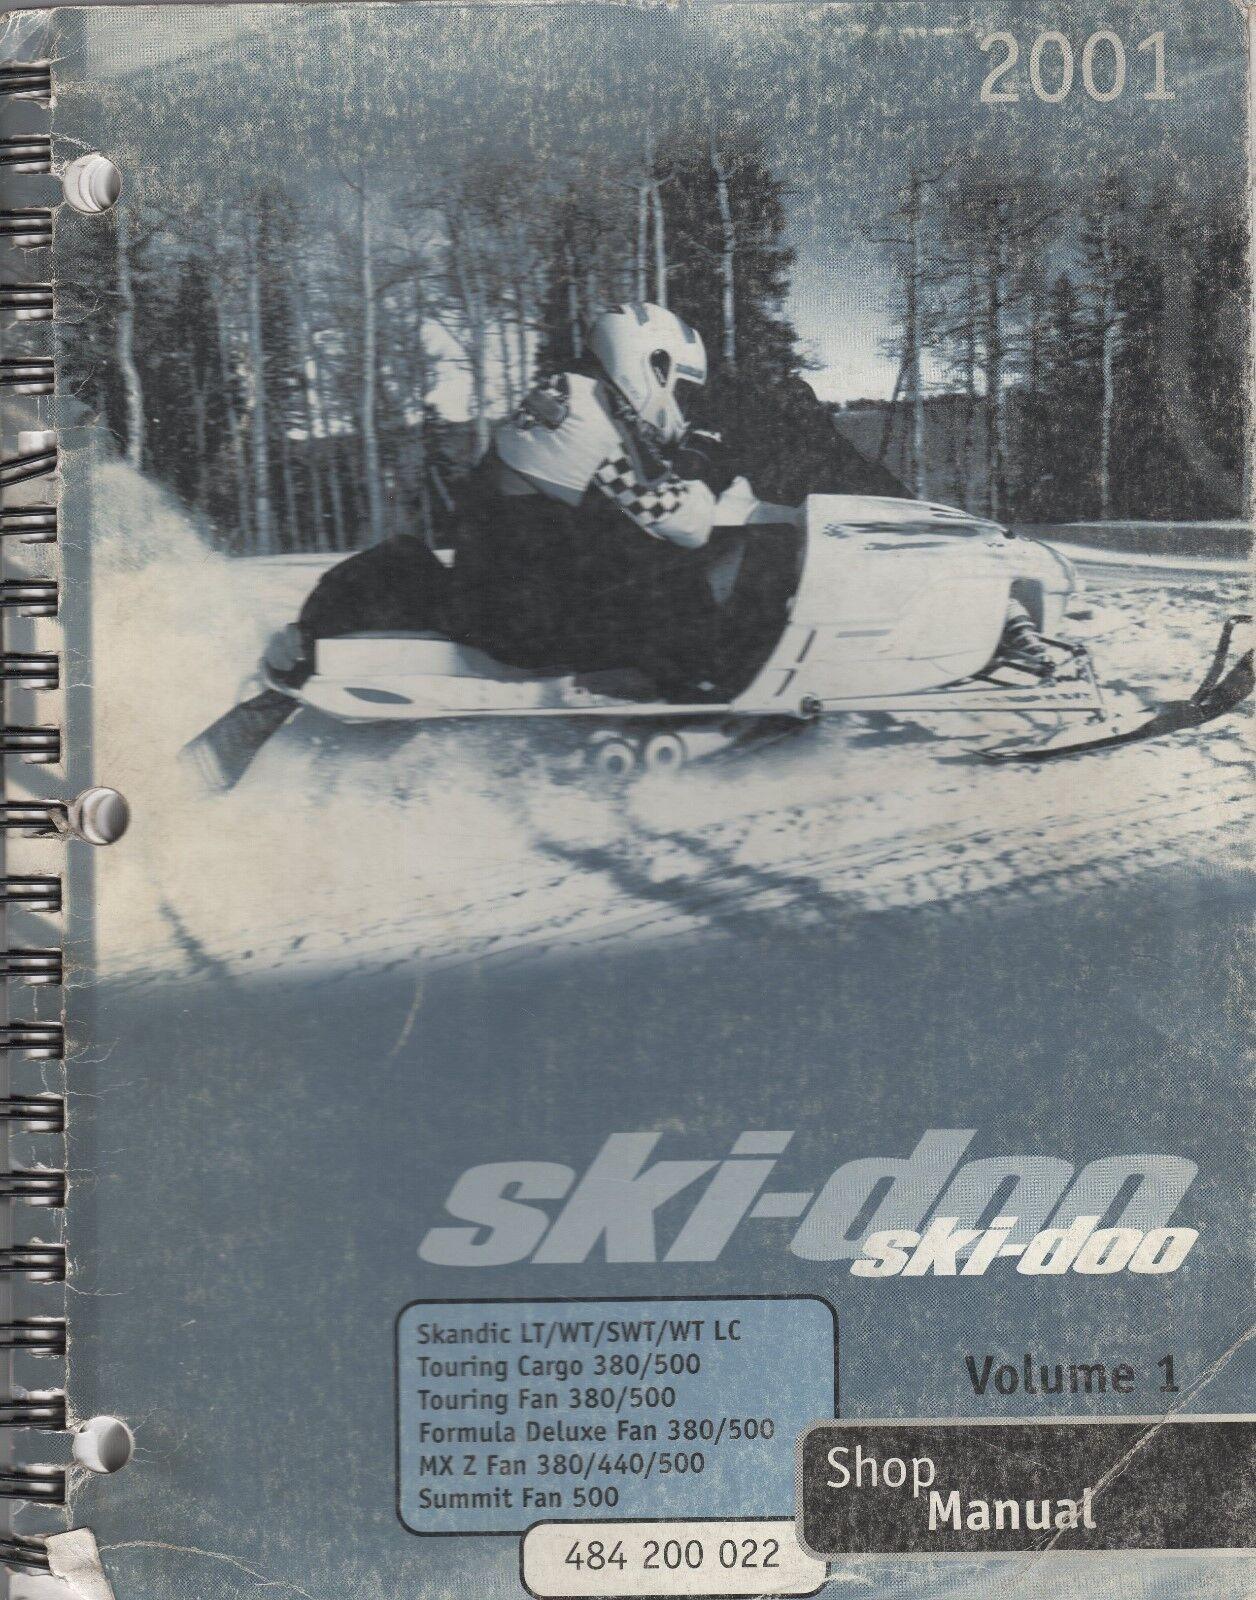 2001 SKI-DOO SNOWMOBILE SHOP MANUAL VOLUME 1 SERIES  484 200 022 (394)